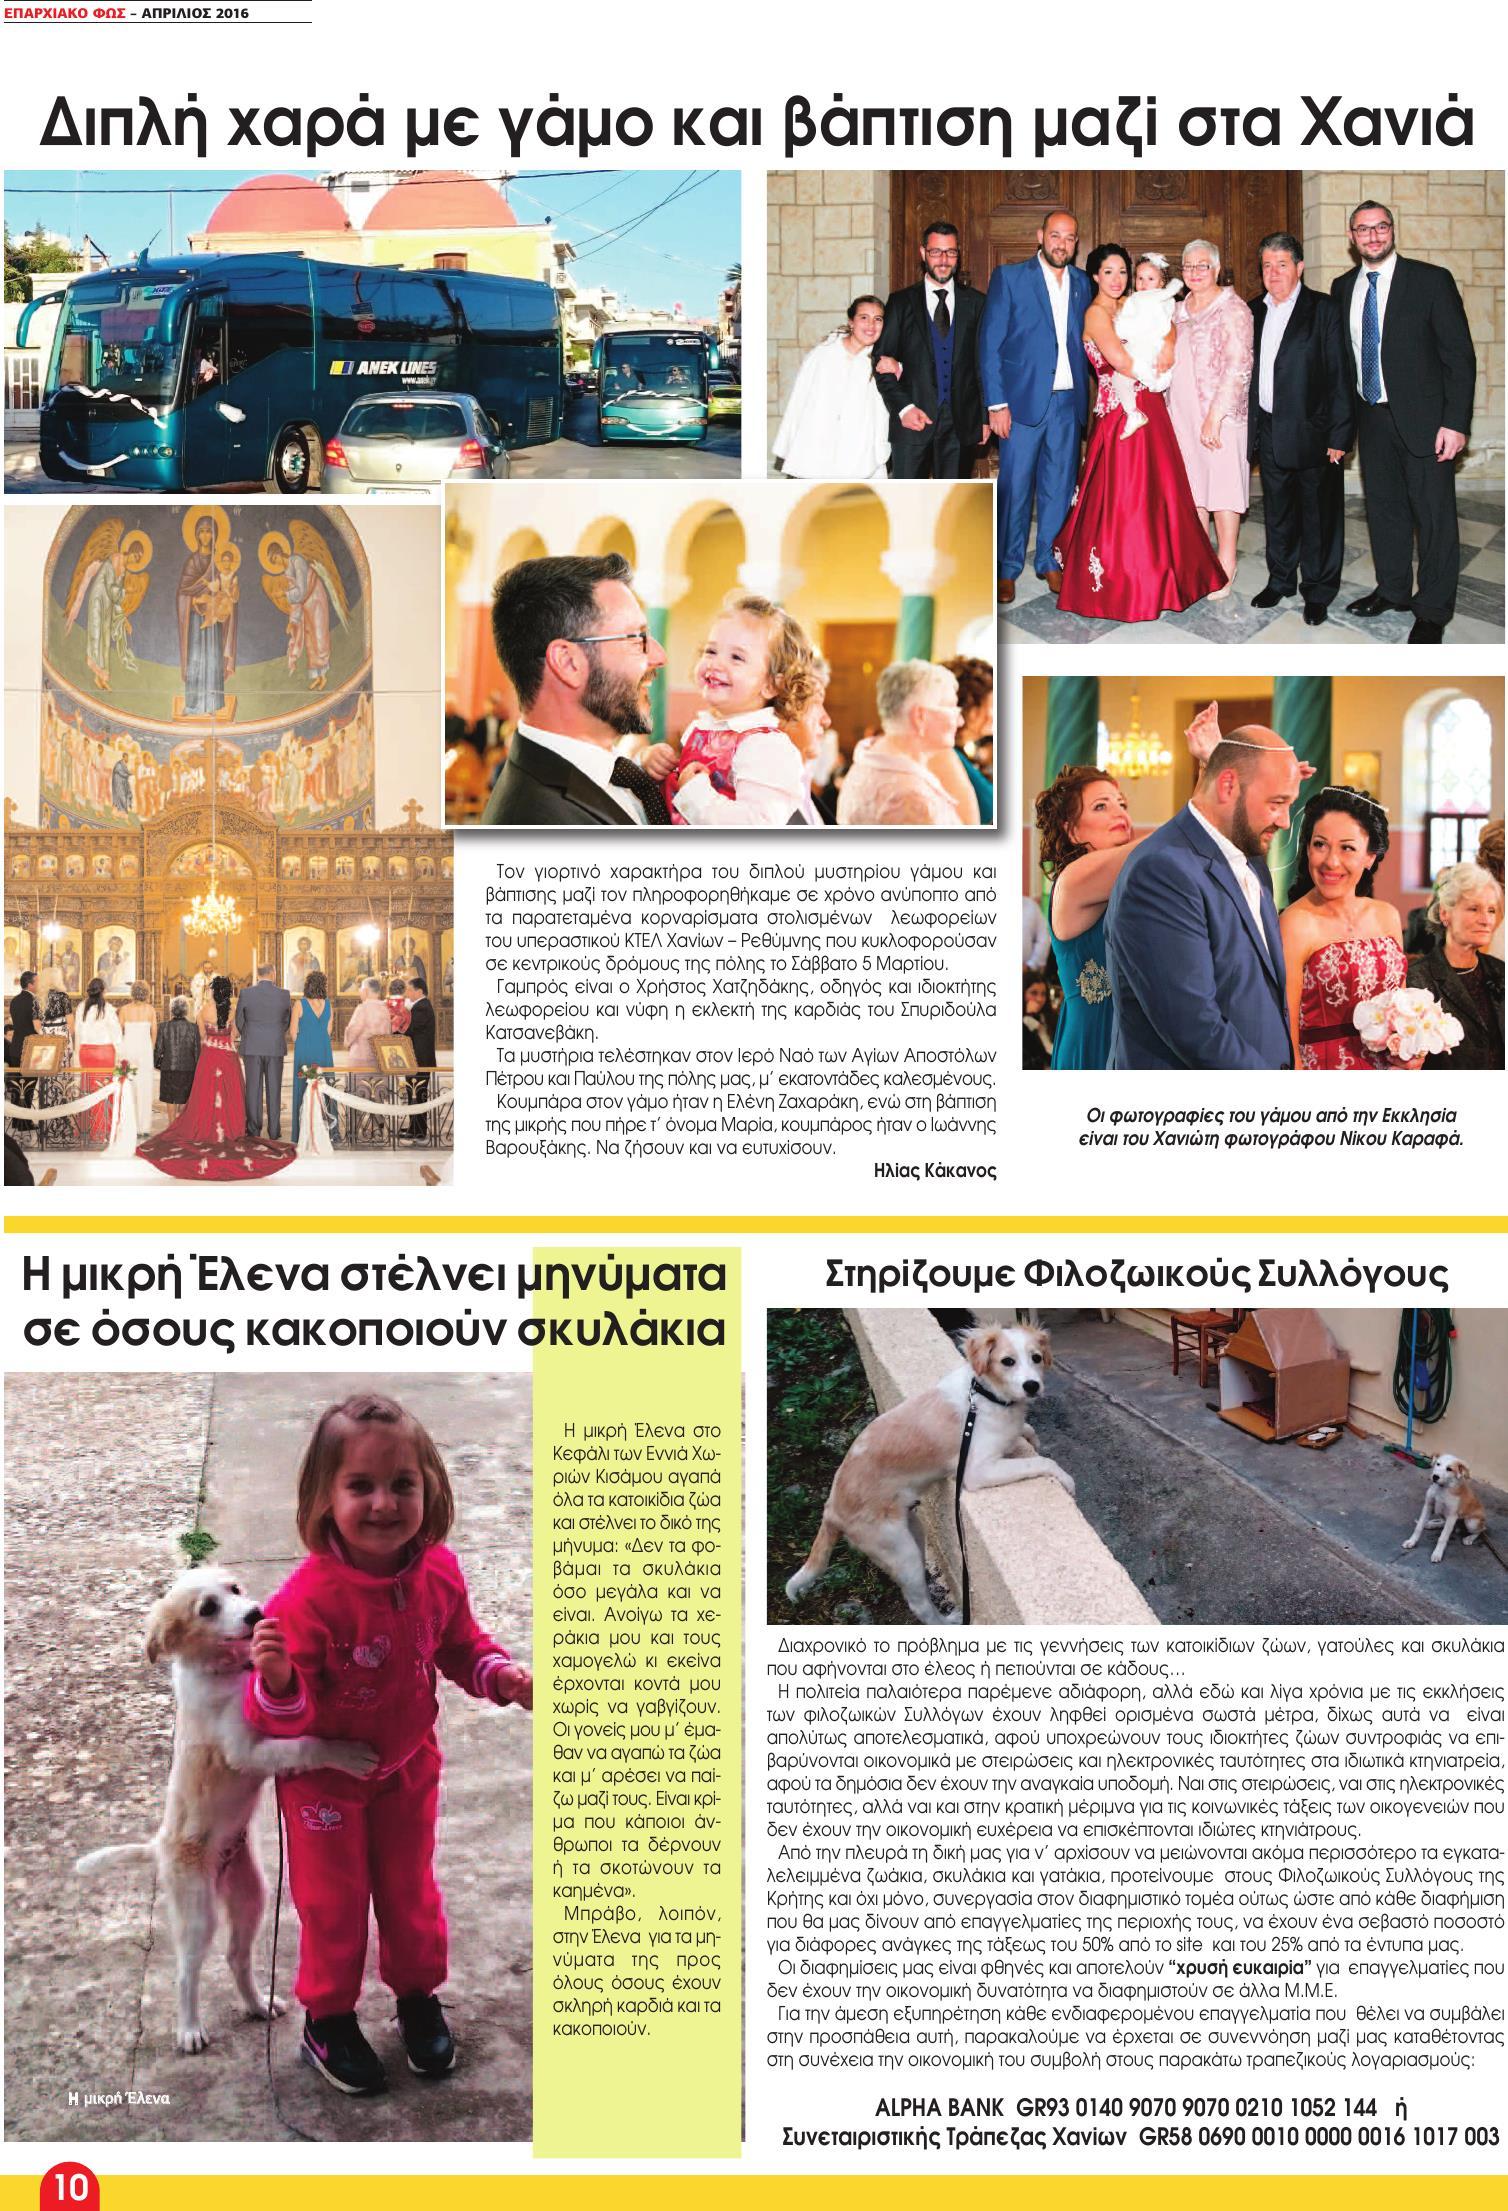 13 KAKANOS (Page 10)